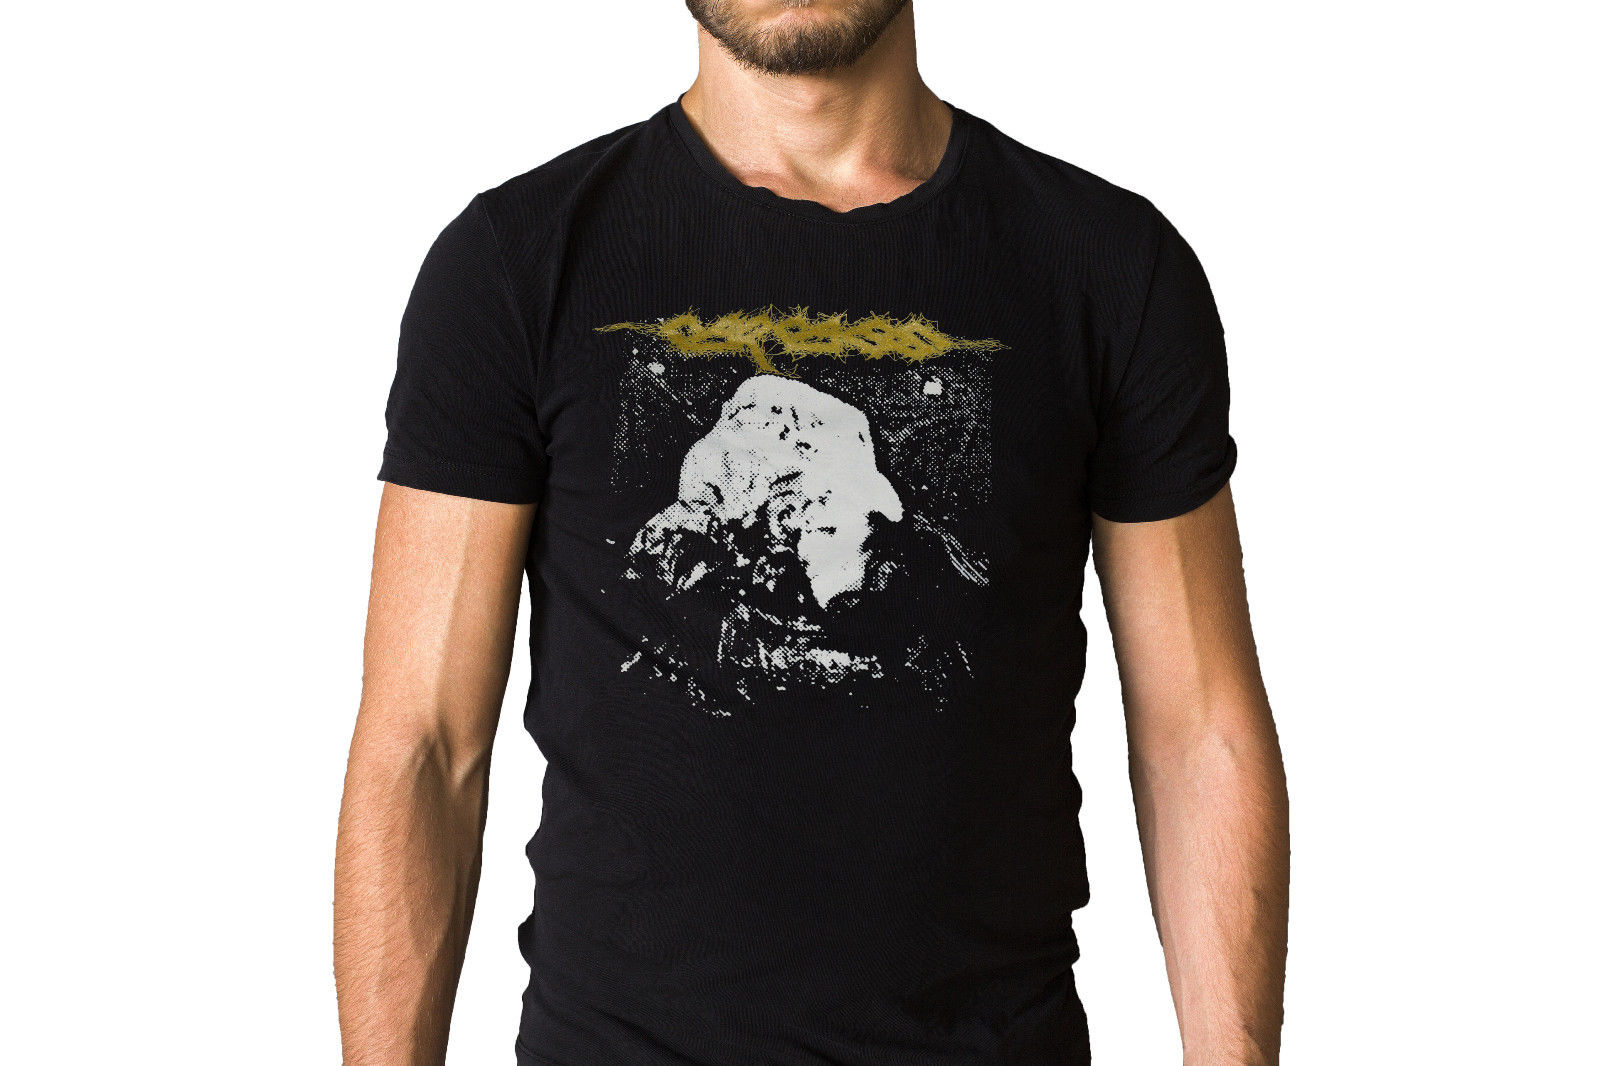 Carcass Symphonies of Sickness 1989 Album Cover T-Shirt 2018 New Short Sleeve Men T Shirt Round Neck Crazy Top Tee